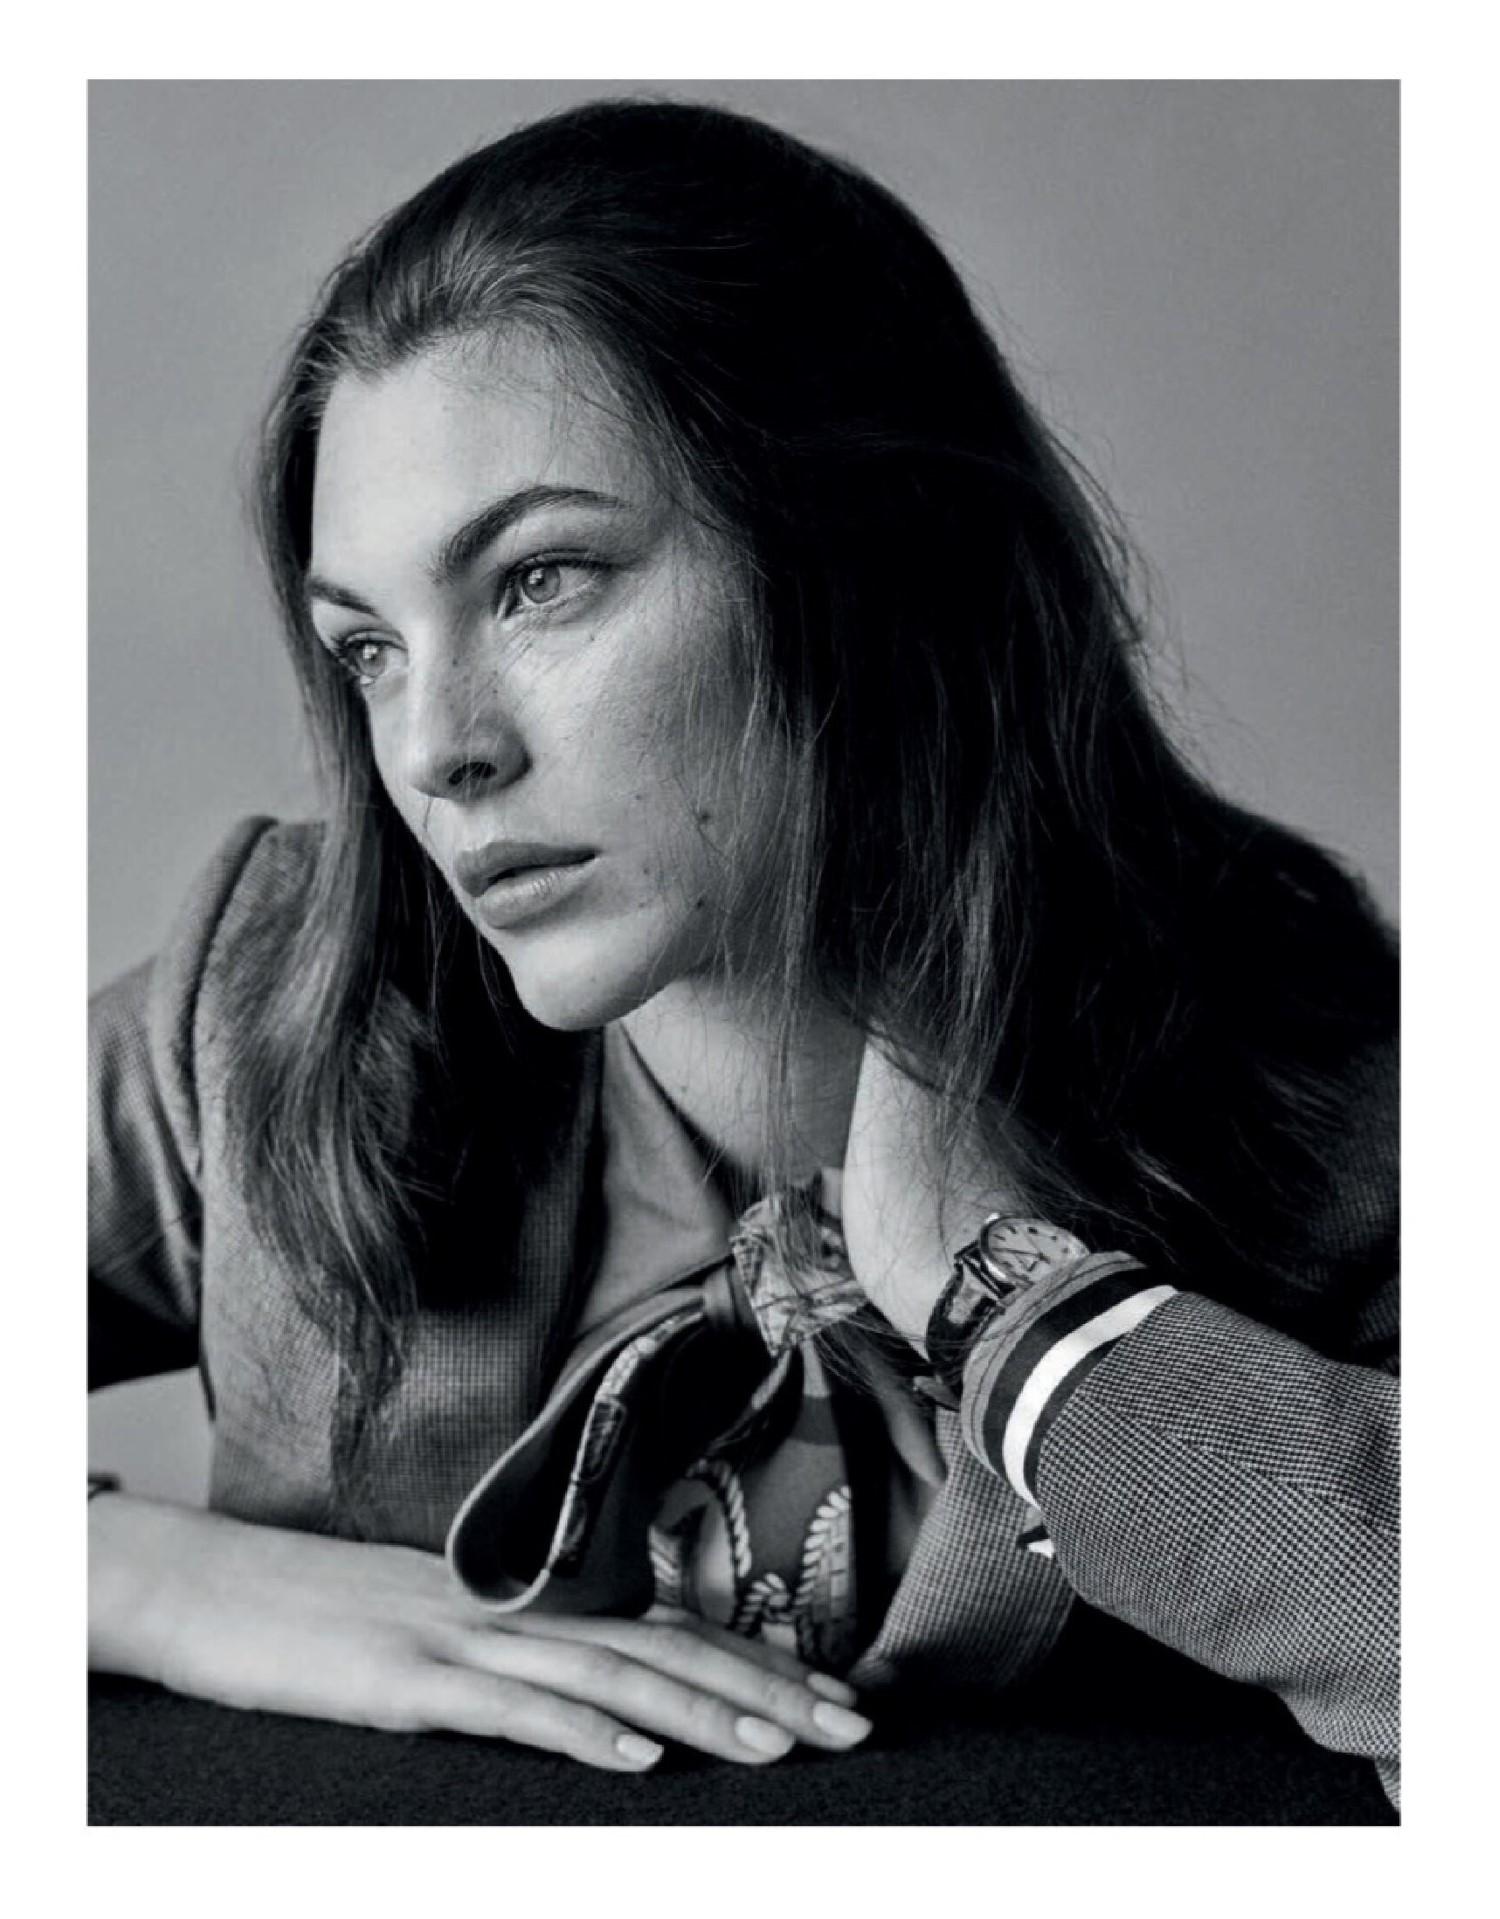 Vittoria Ceretti by Giampaolo Sgura for Vogue Paris Sept 2019 (9).jpg